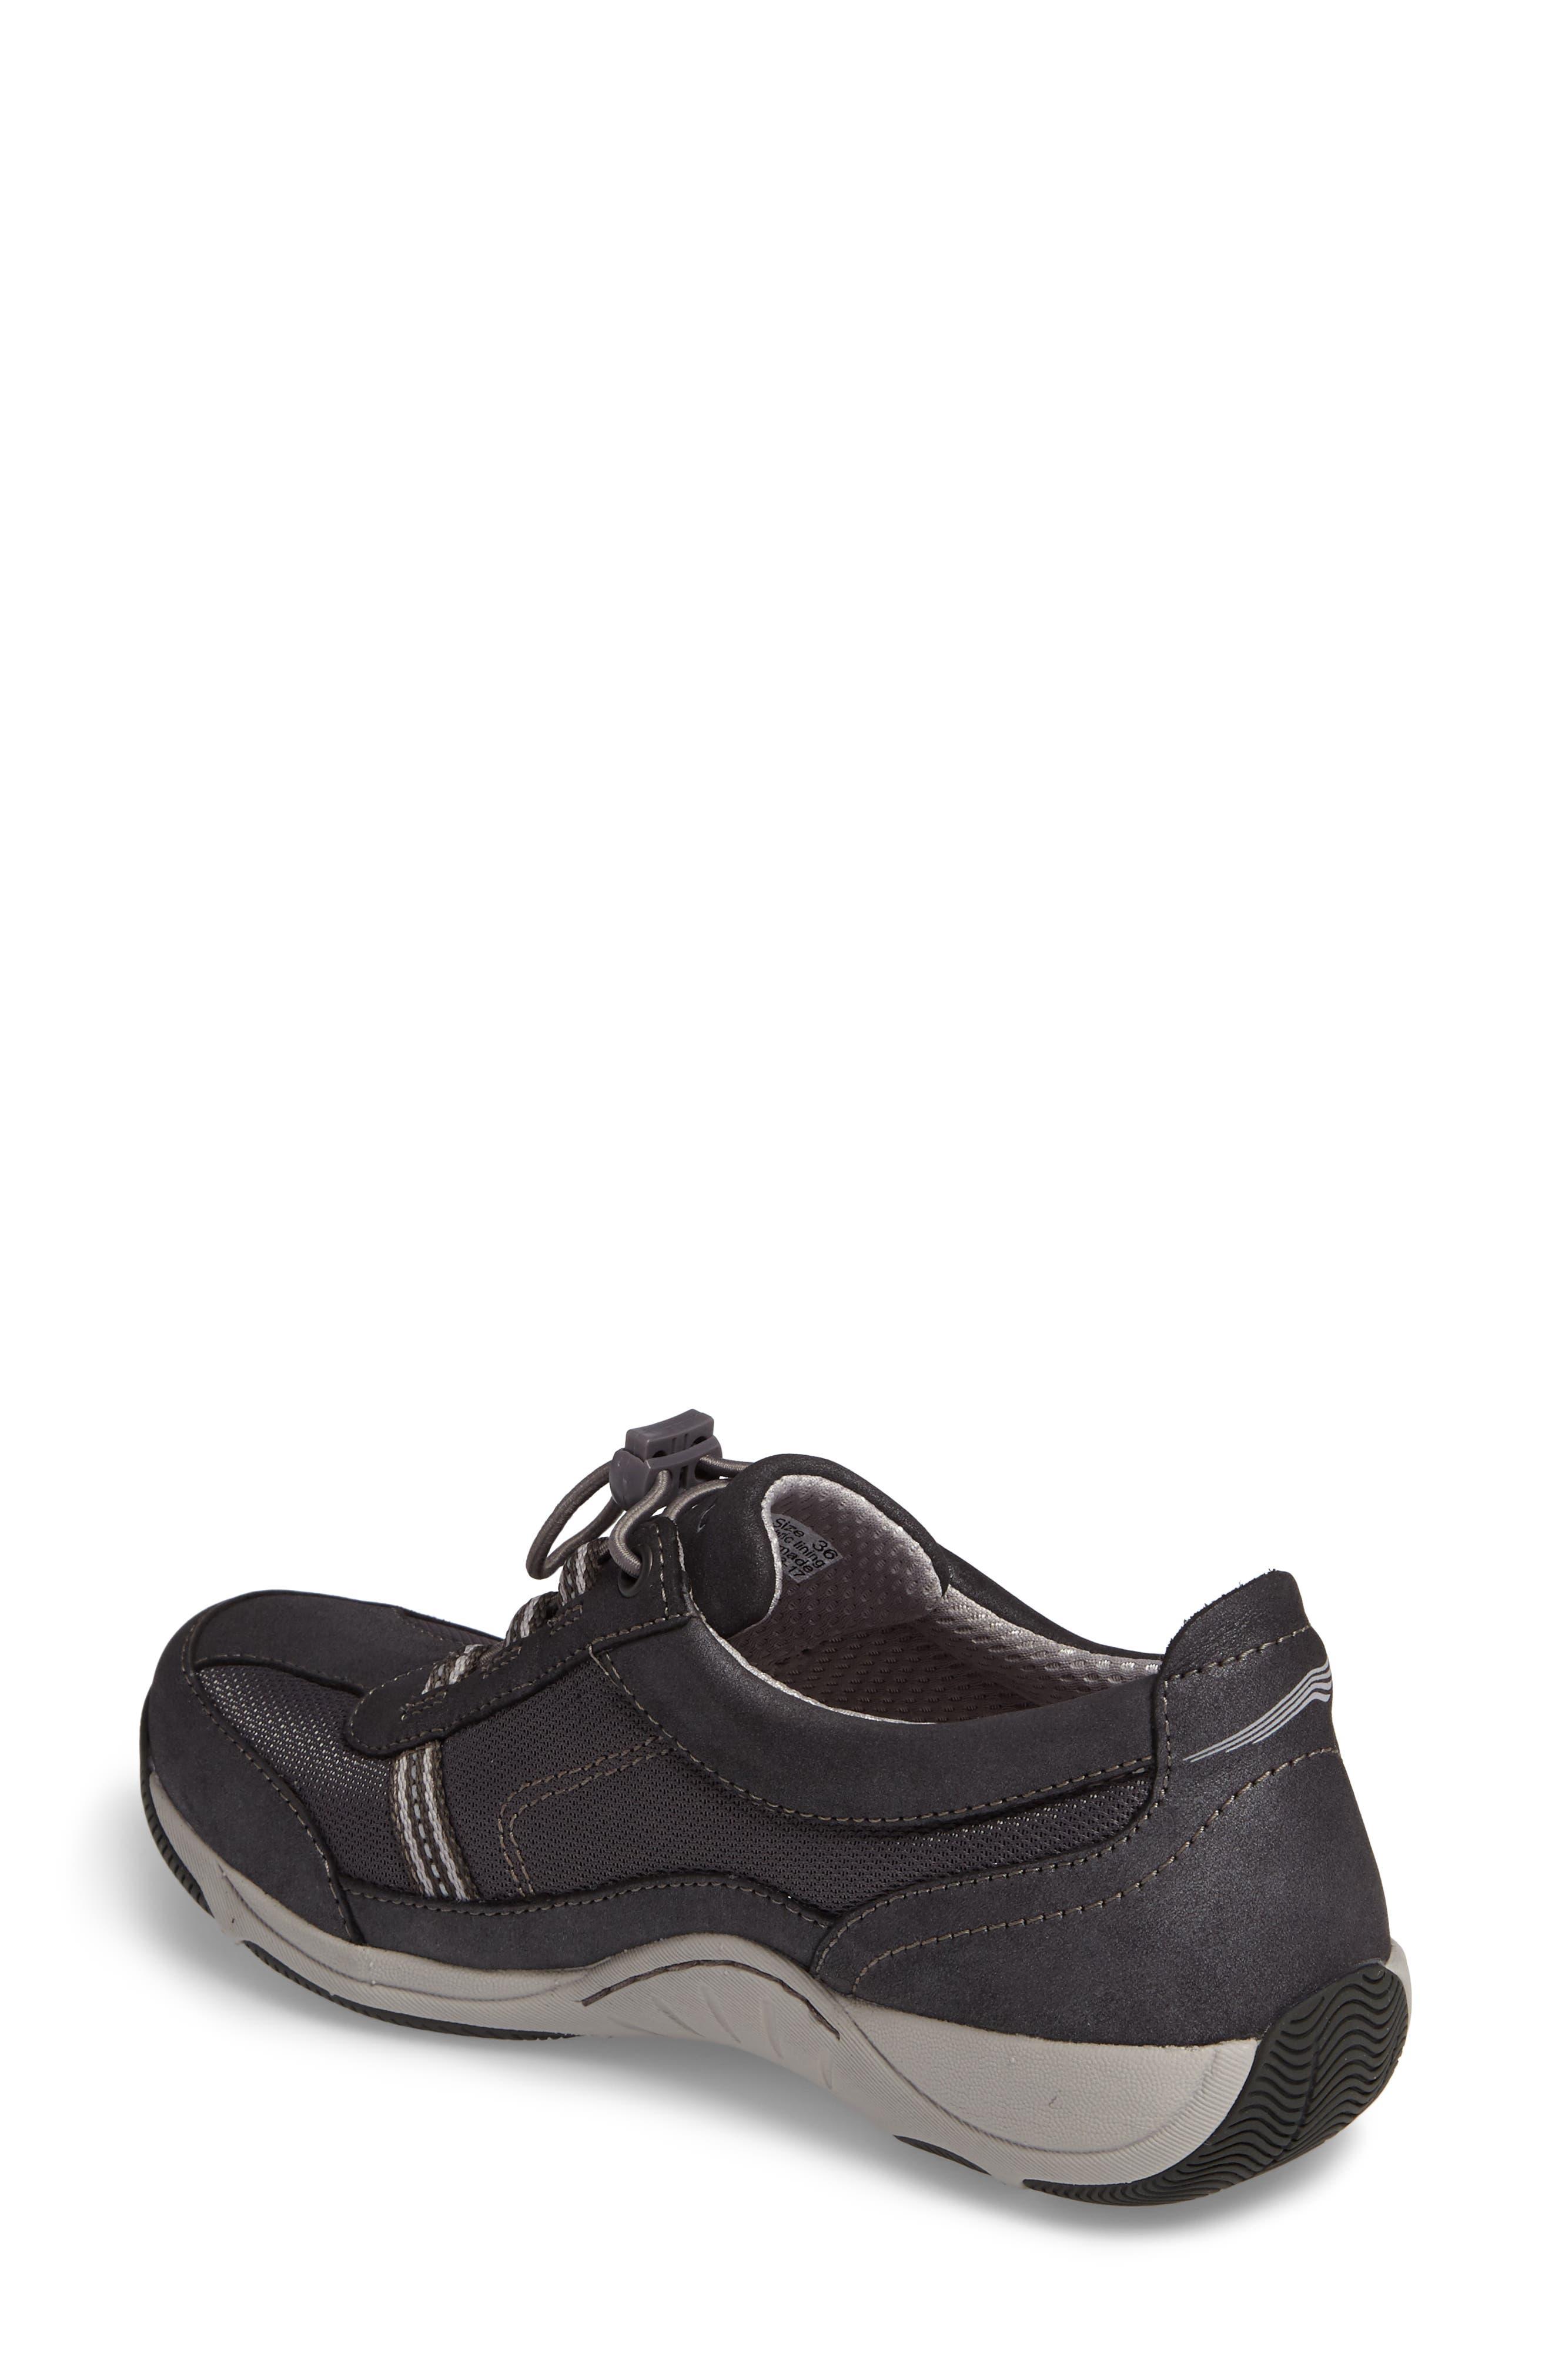 'Helen' Suede & Mesh Sneaker,                             Alternate thumbnail 22, color,